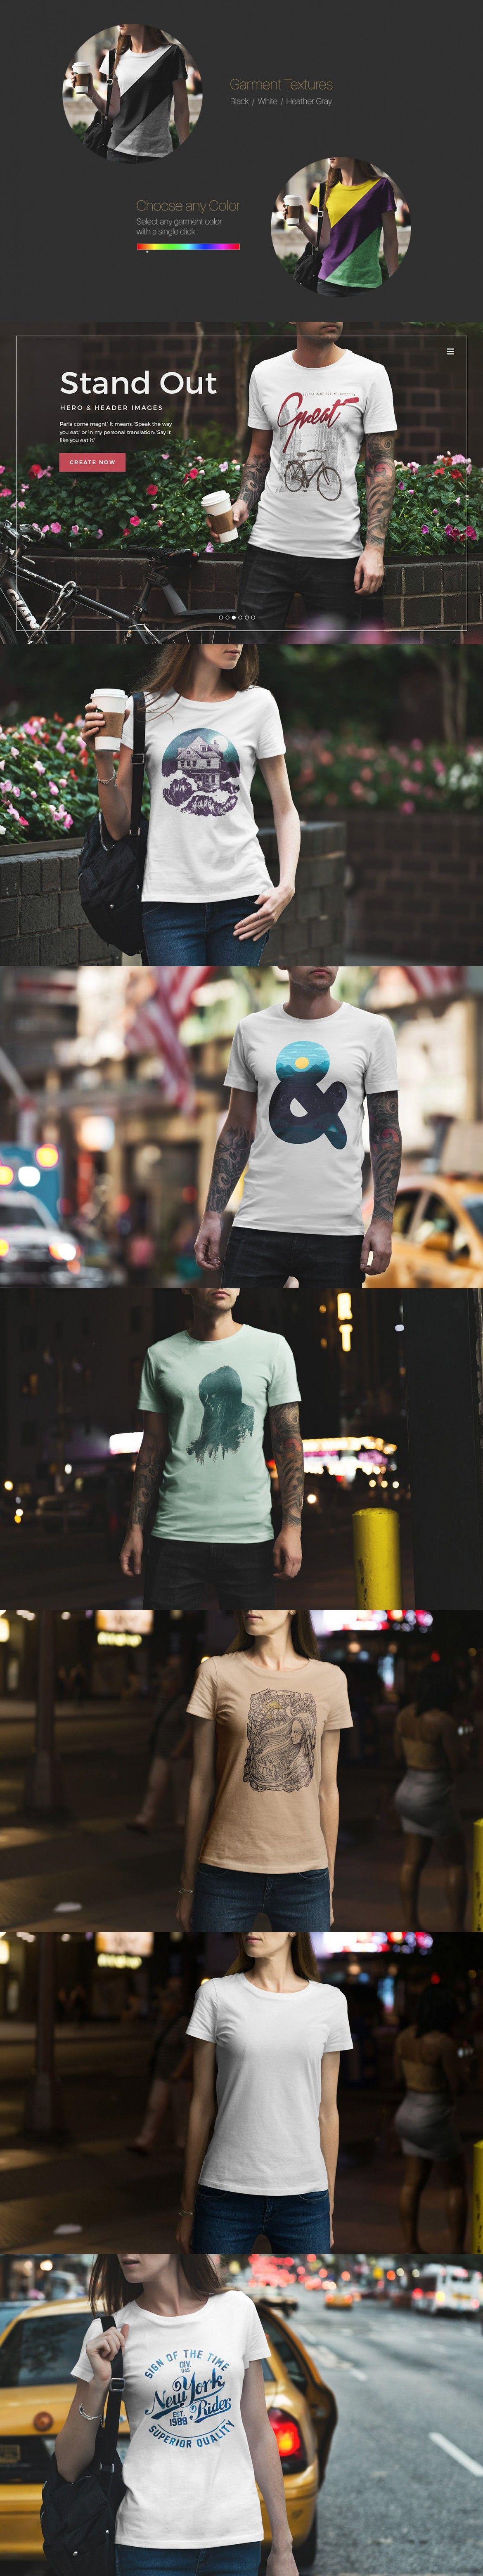 Download T Shirt Mockup Urban Edition Vol 3 By Genetic96 On Envato Elements Shirt Mockup Tshirt Mockup Shirts